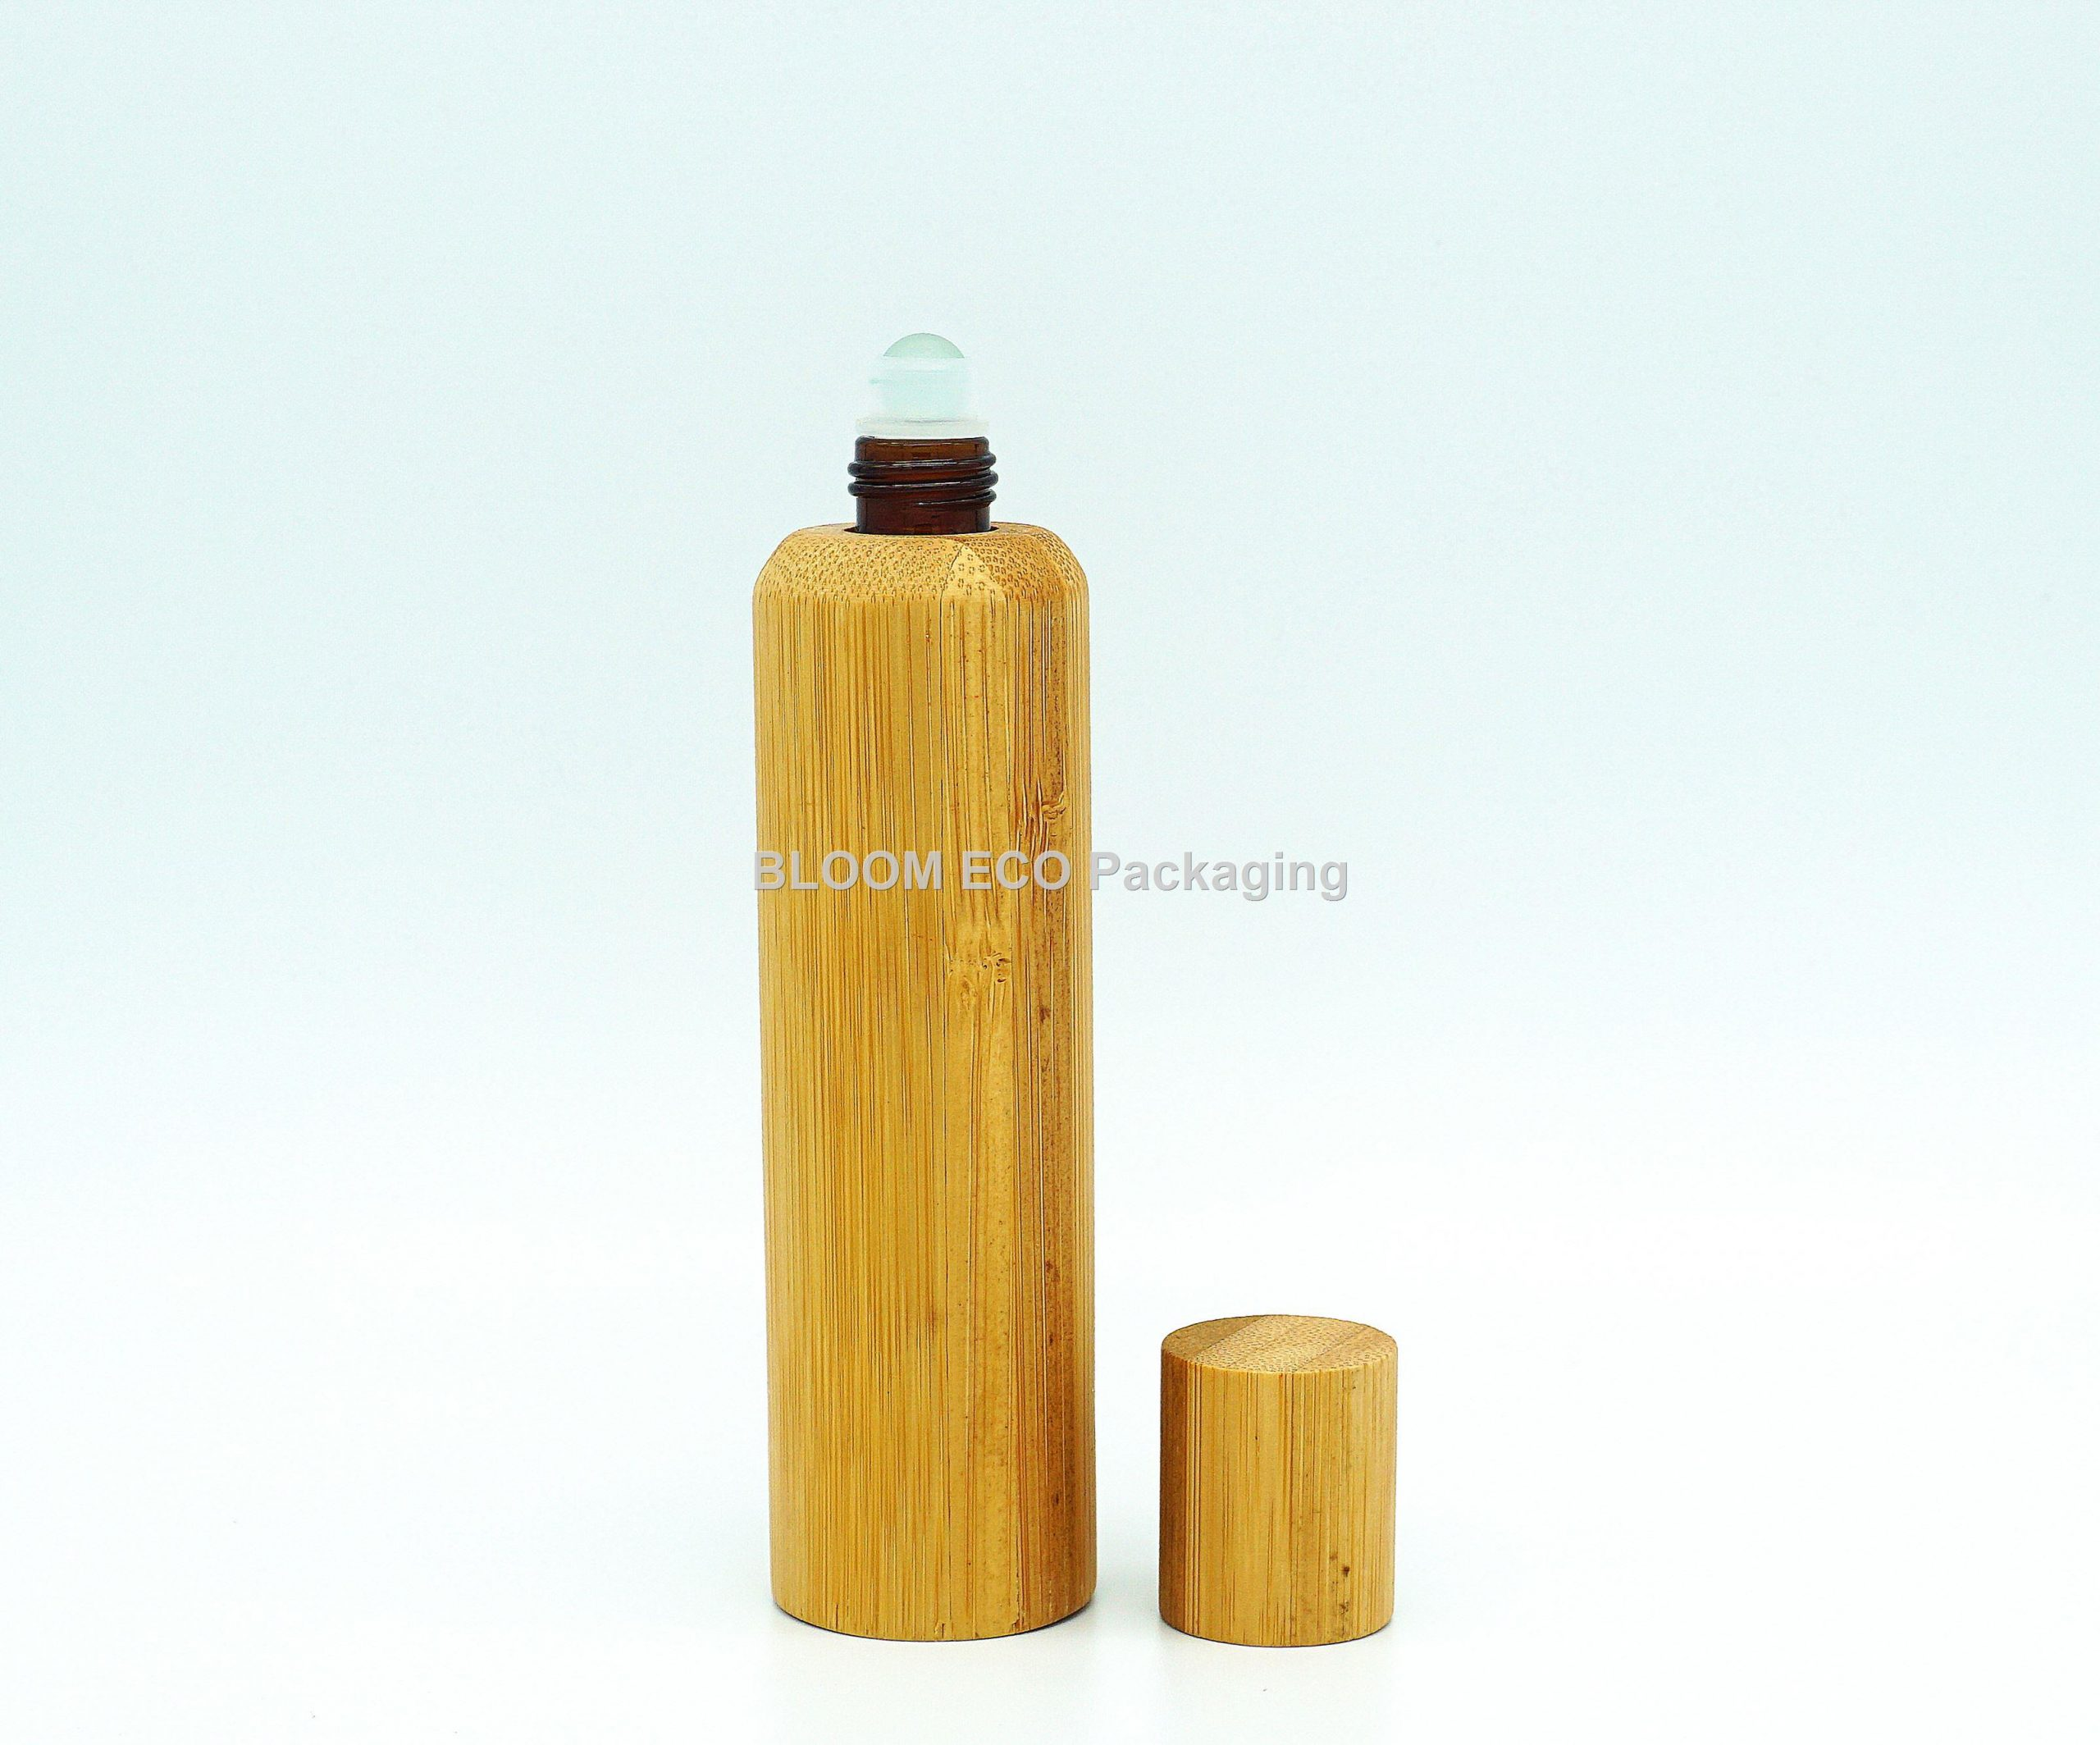 PR1001 Bamboo Pet Roll On Bottle